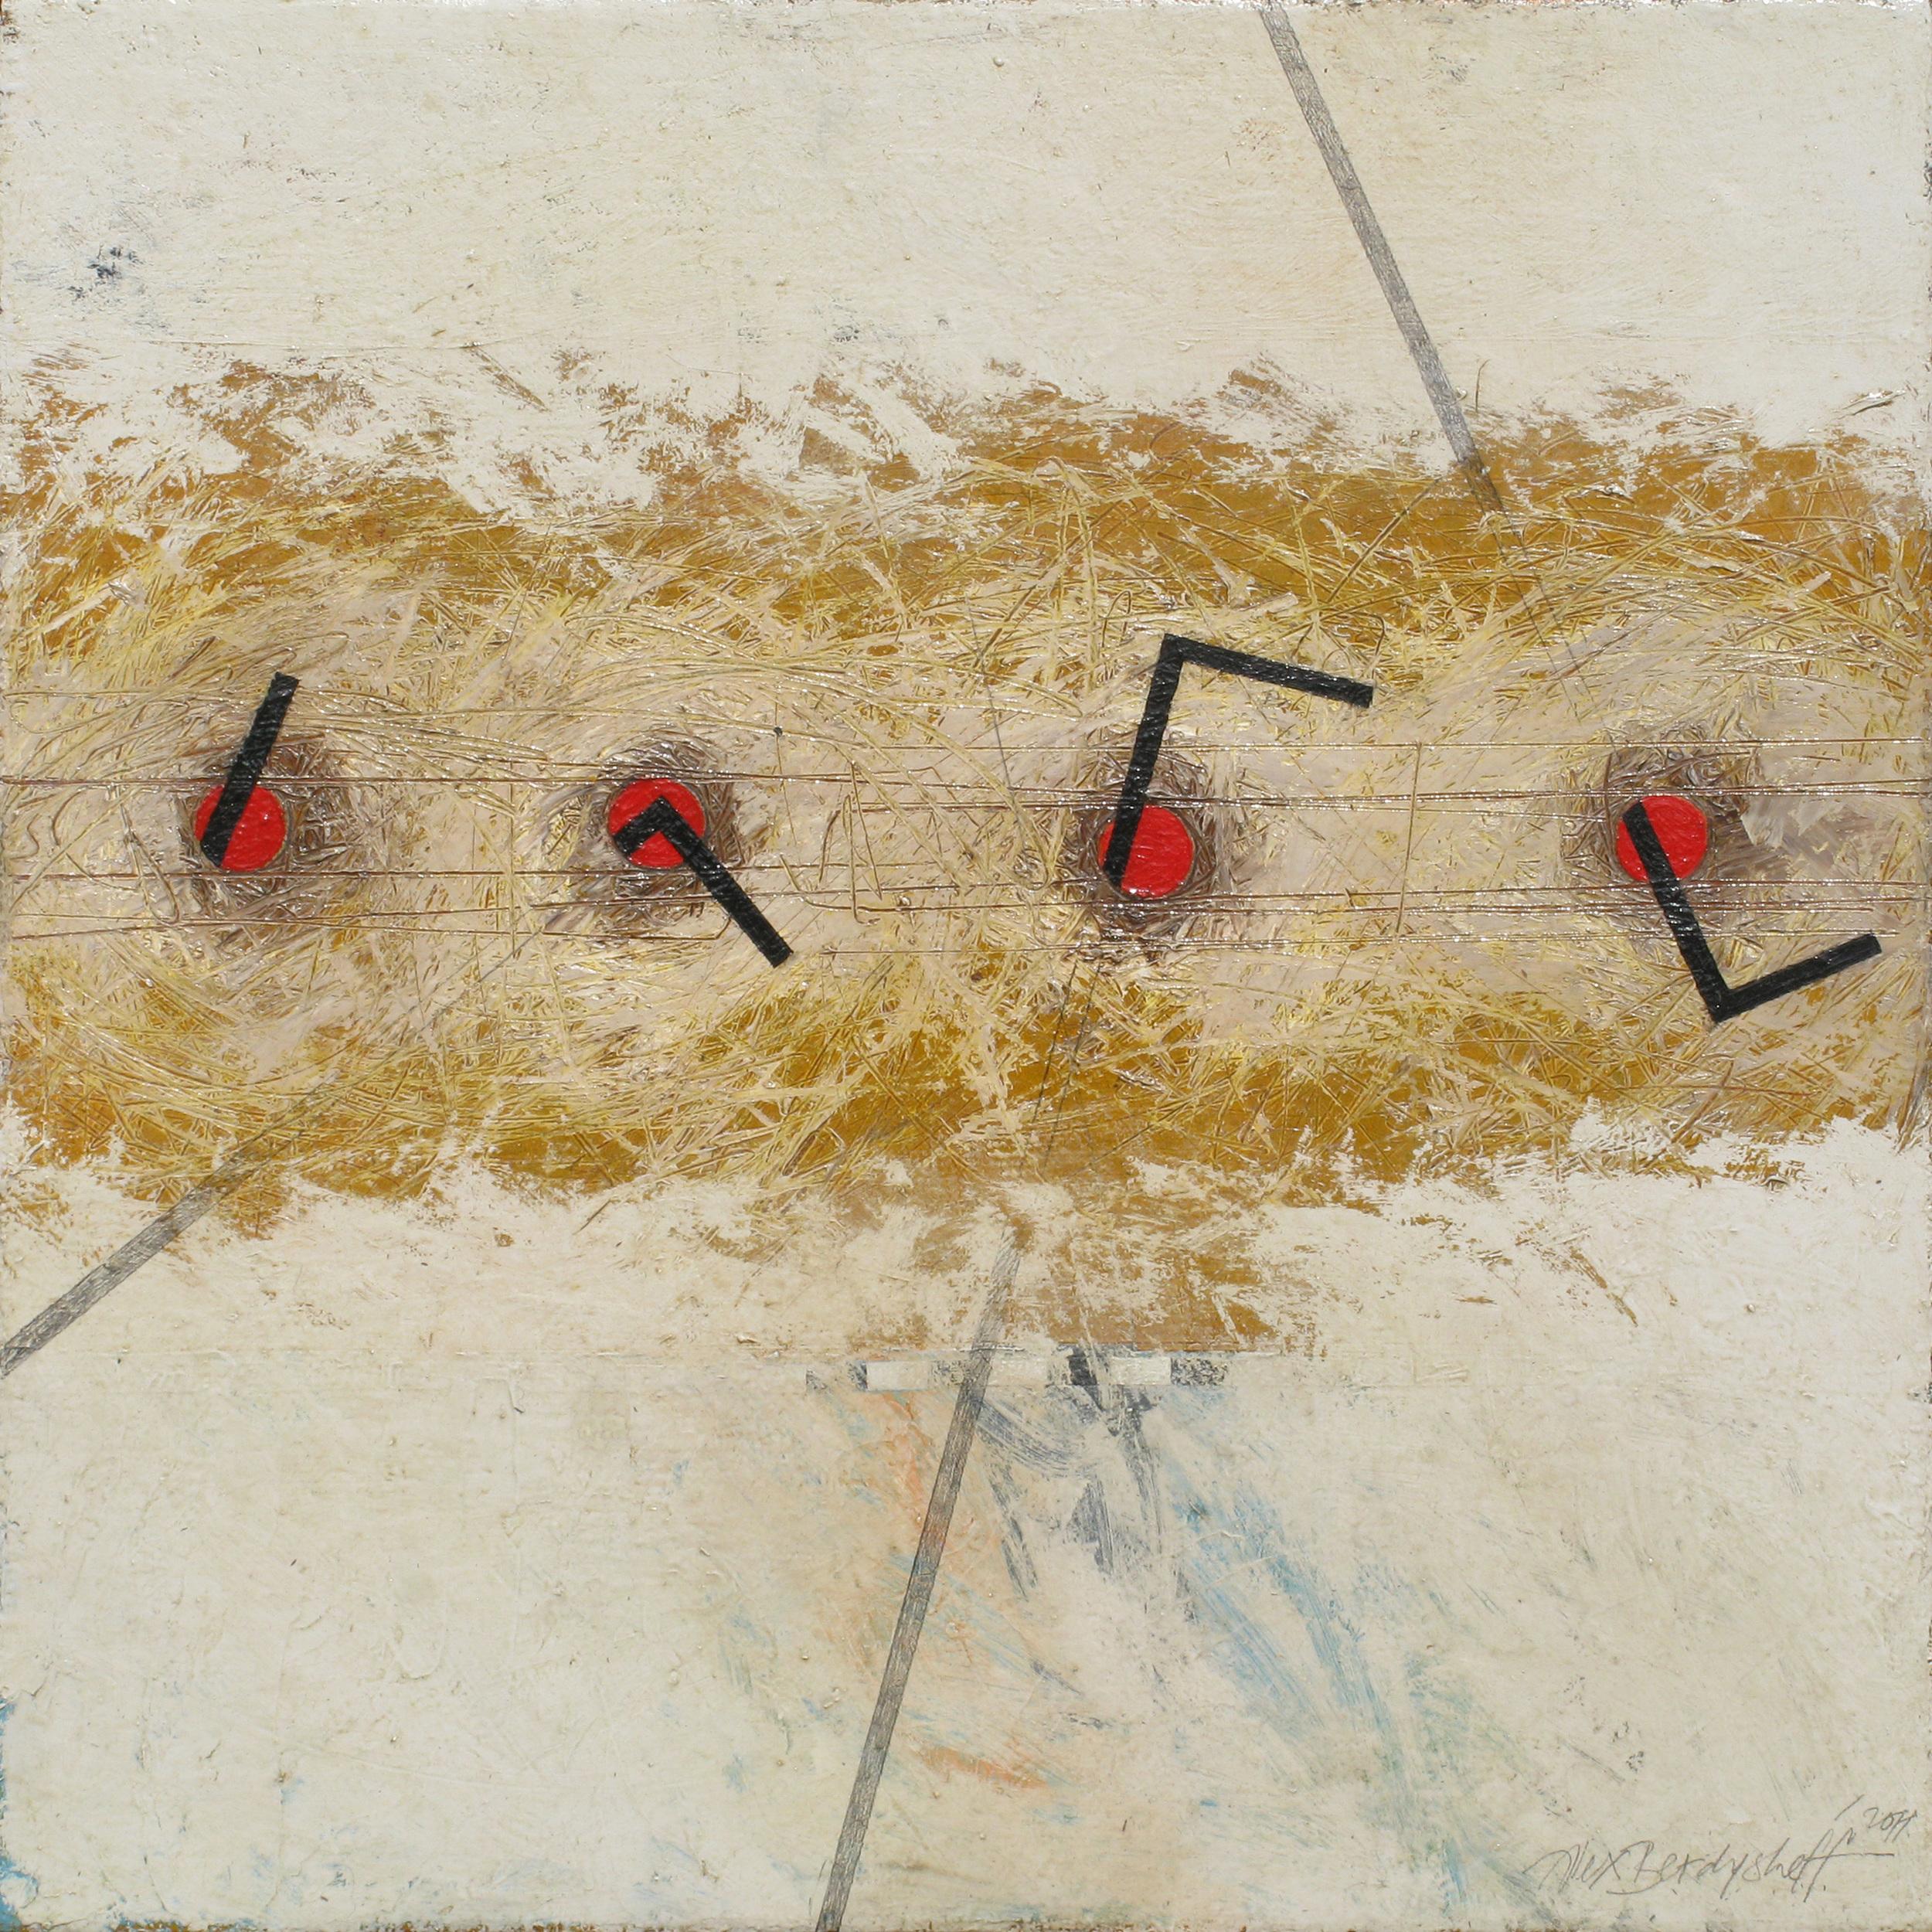 Terra IX, oil on canvas, 46x46 cm, 2011